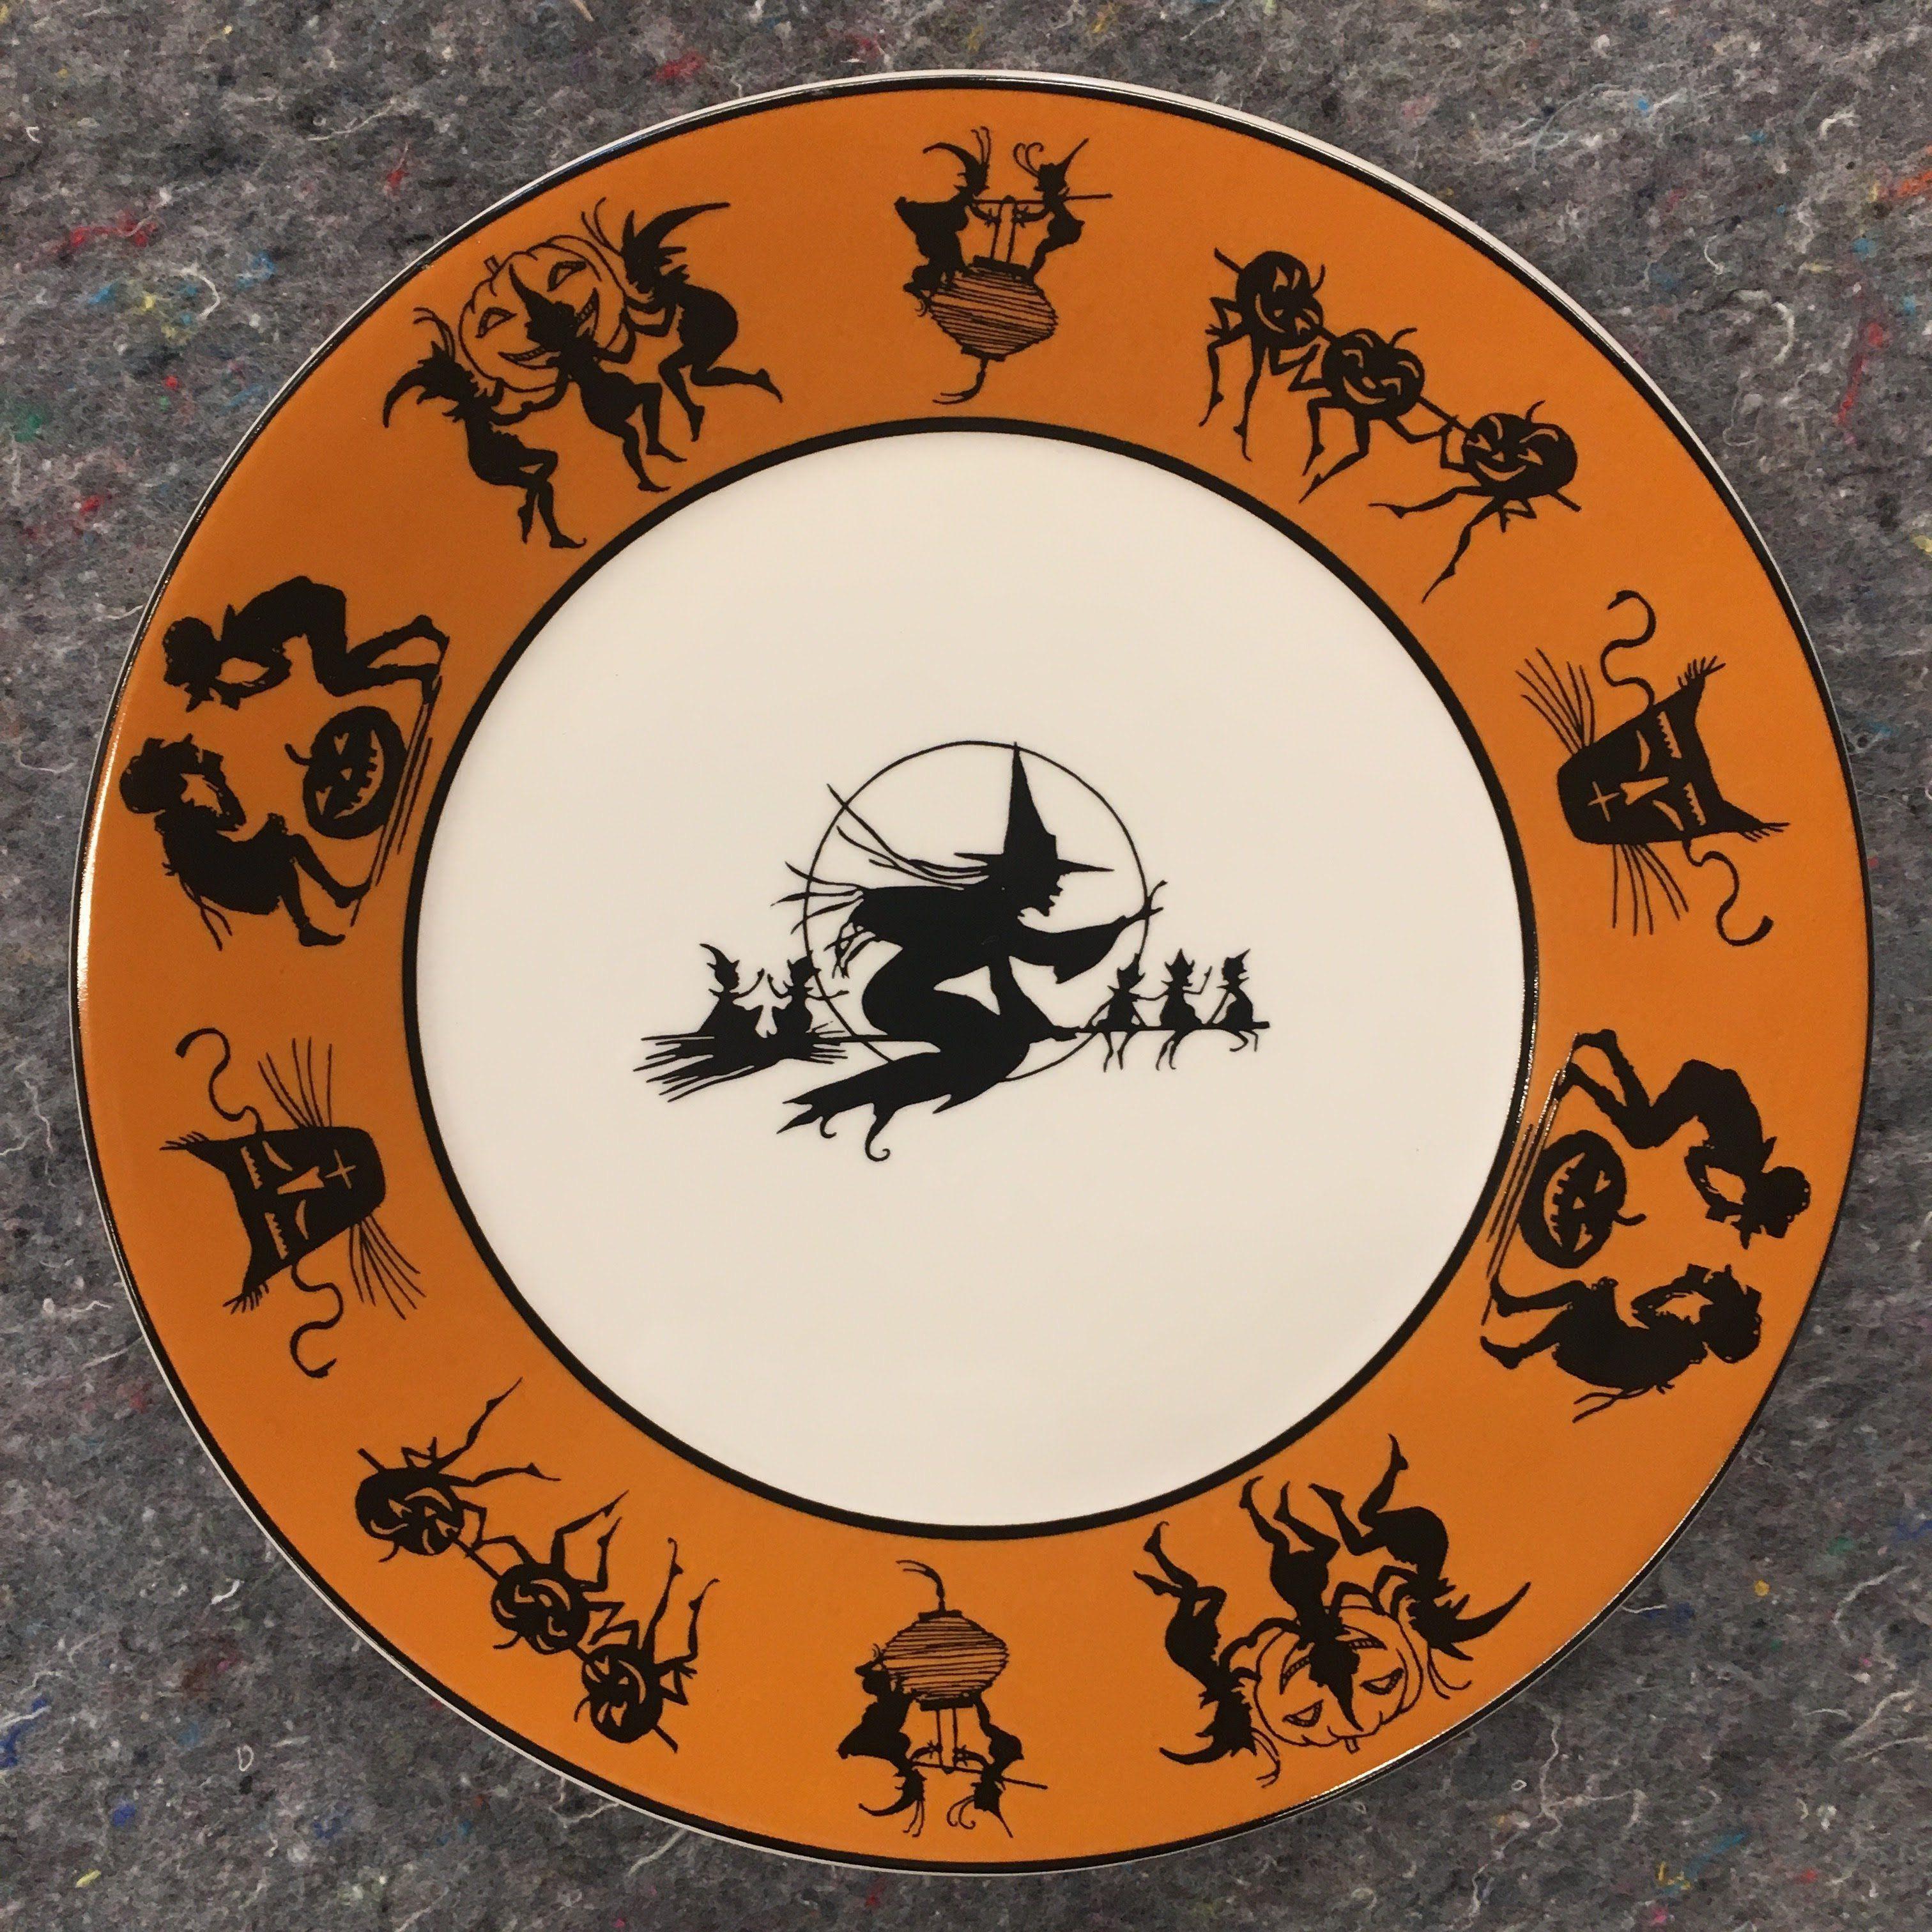 Bruce Elsass Collection Bethany Lowe Hobgoblins Porcelain Dinner Plate Halloween Plates Halloween Dinnerware Vintage Halloween Crafts